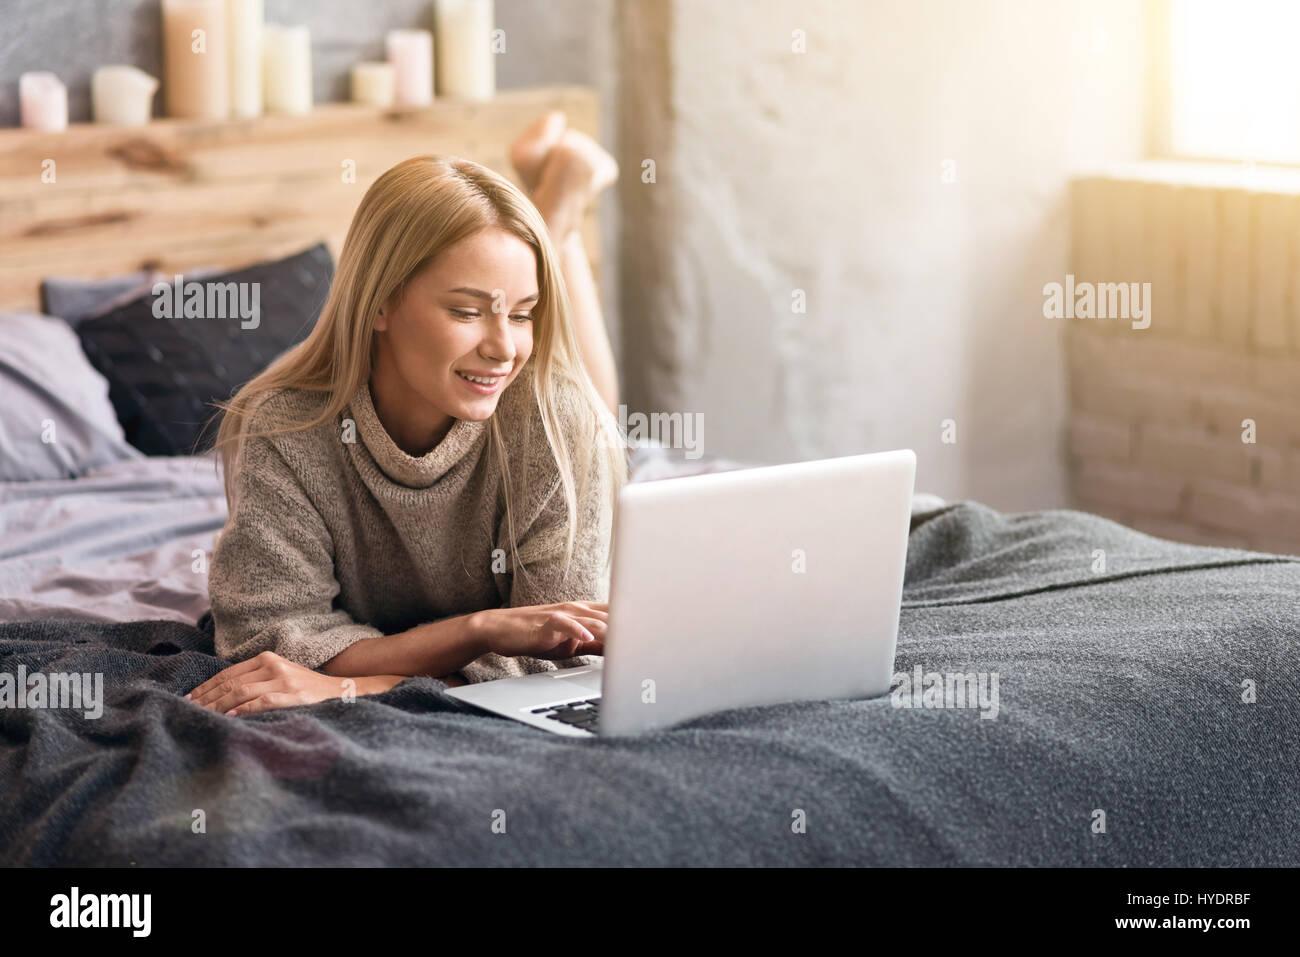 Gentle young woman enjoying freelance job at home - Stock Image